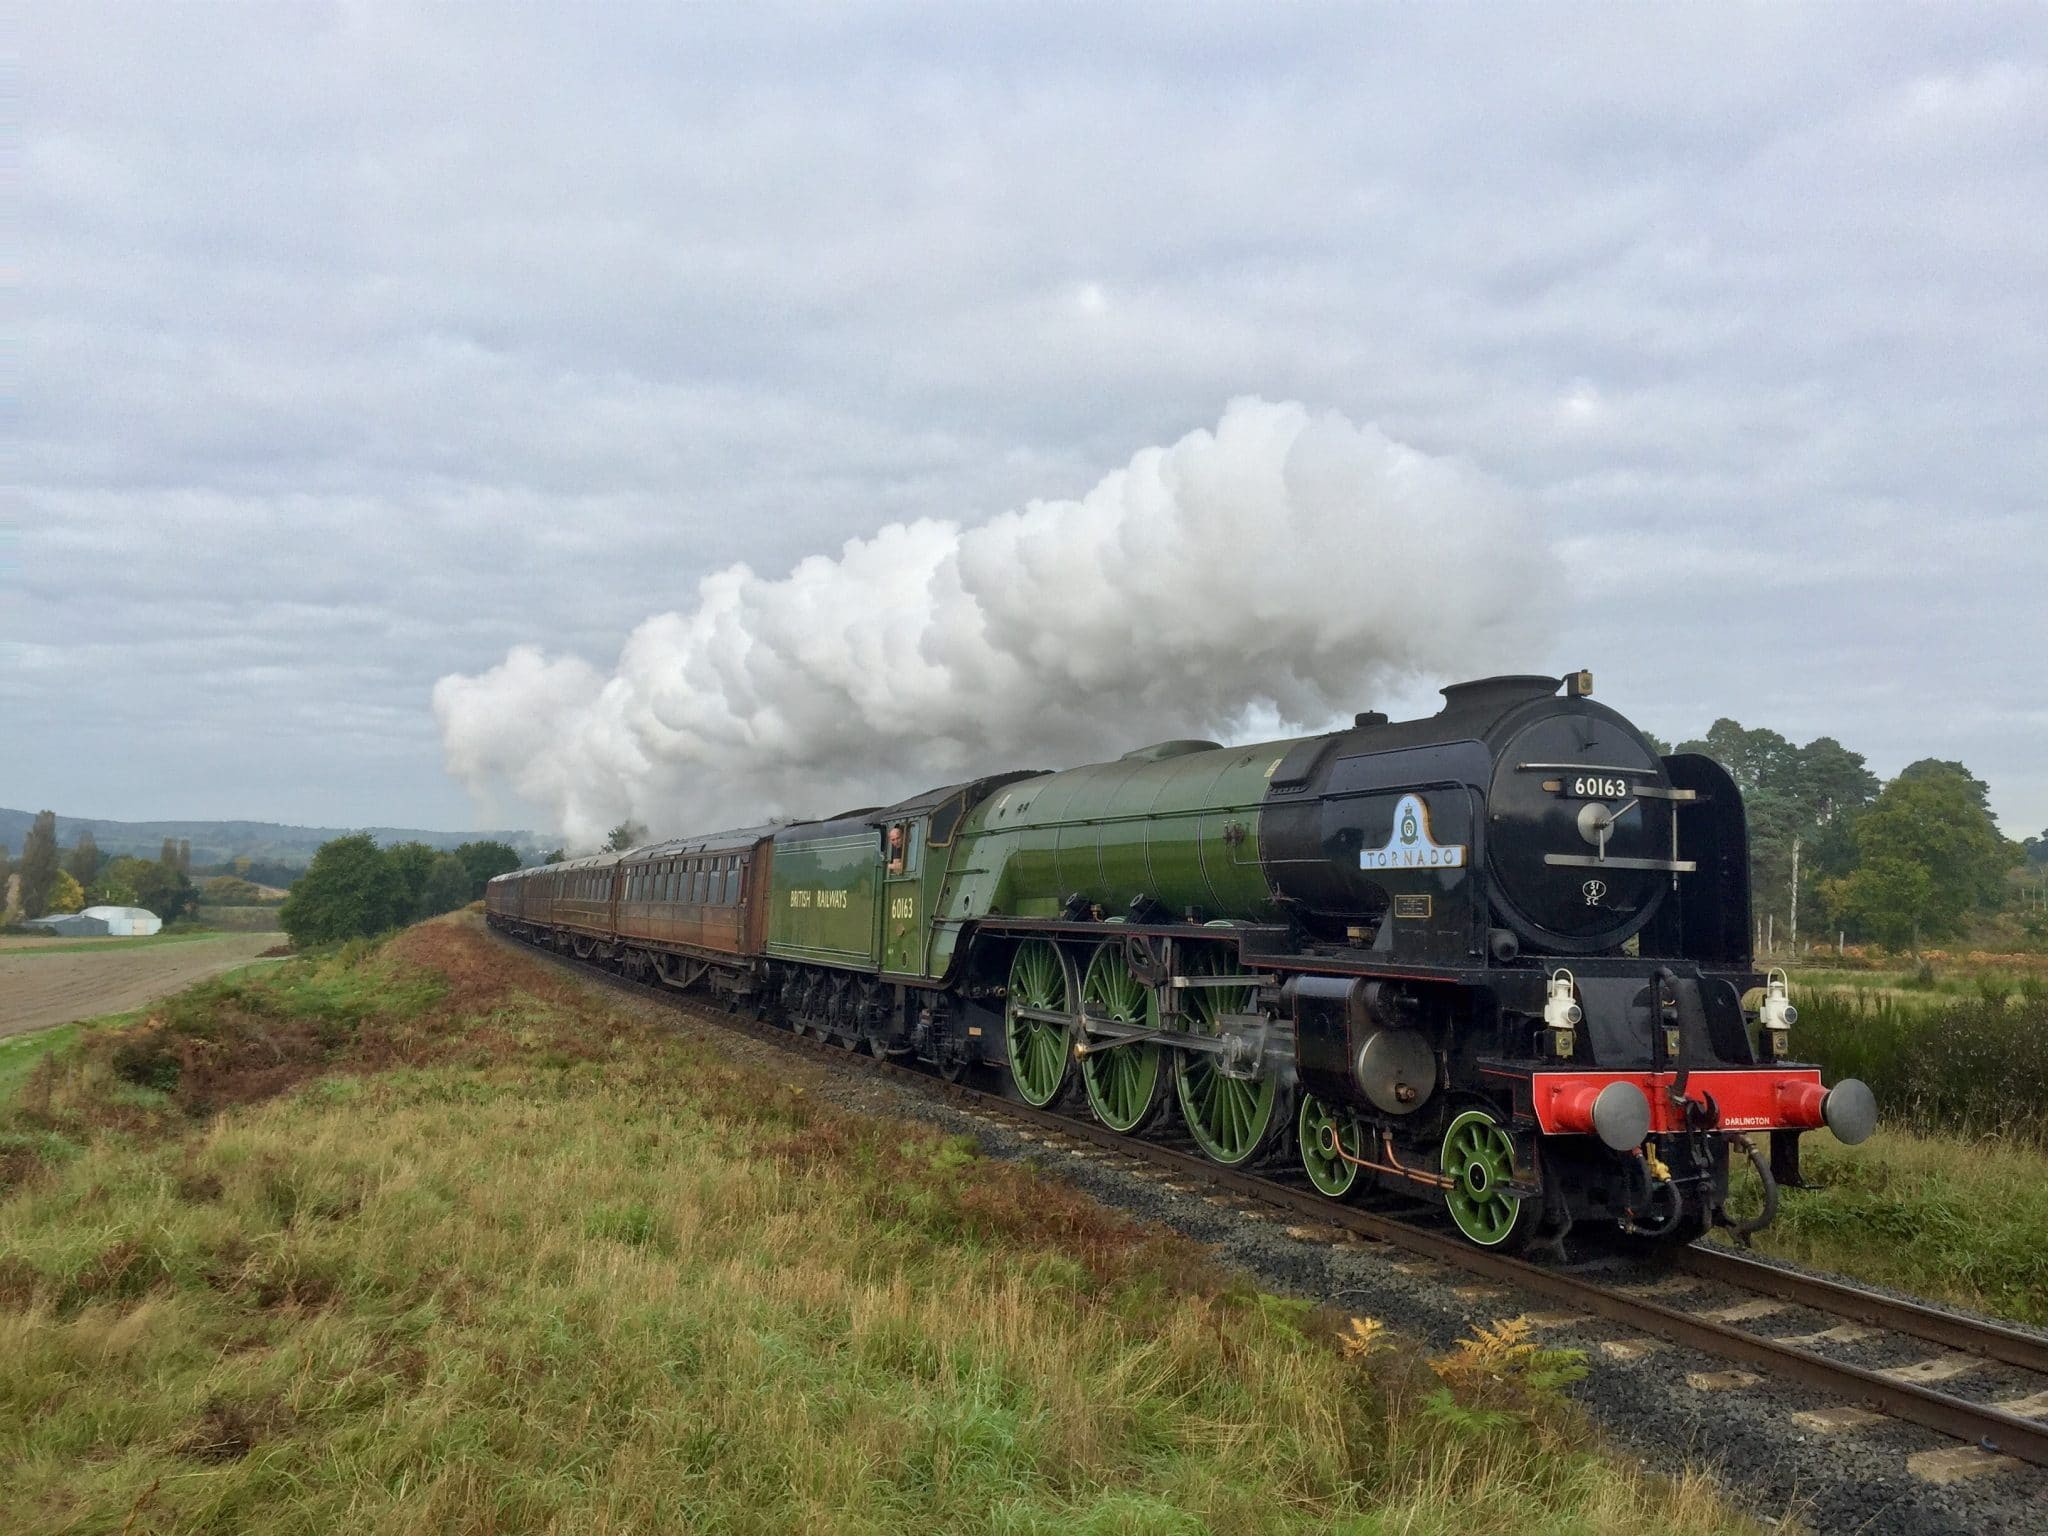 60163 - Tornado locomotive - LNER Peppercorn Class - A1 locomotive